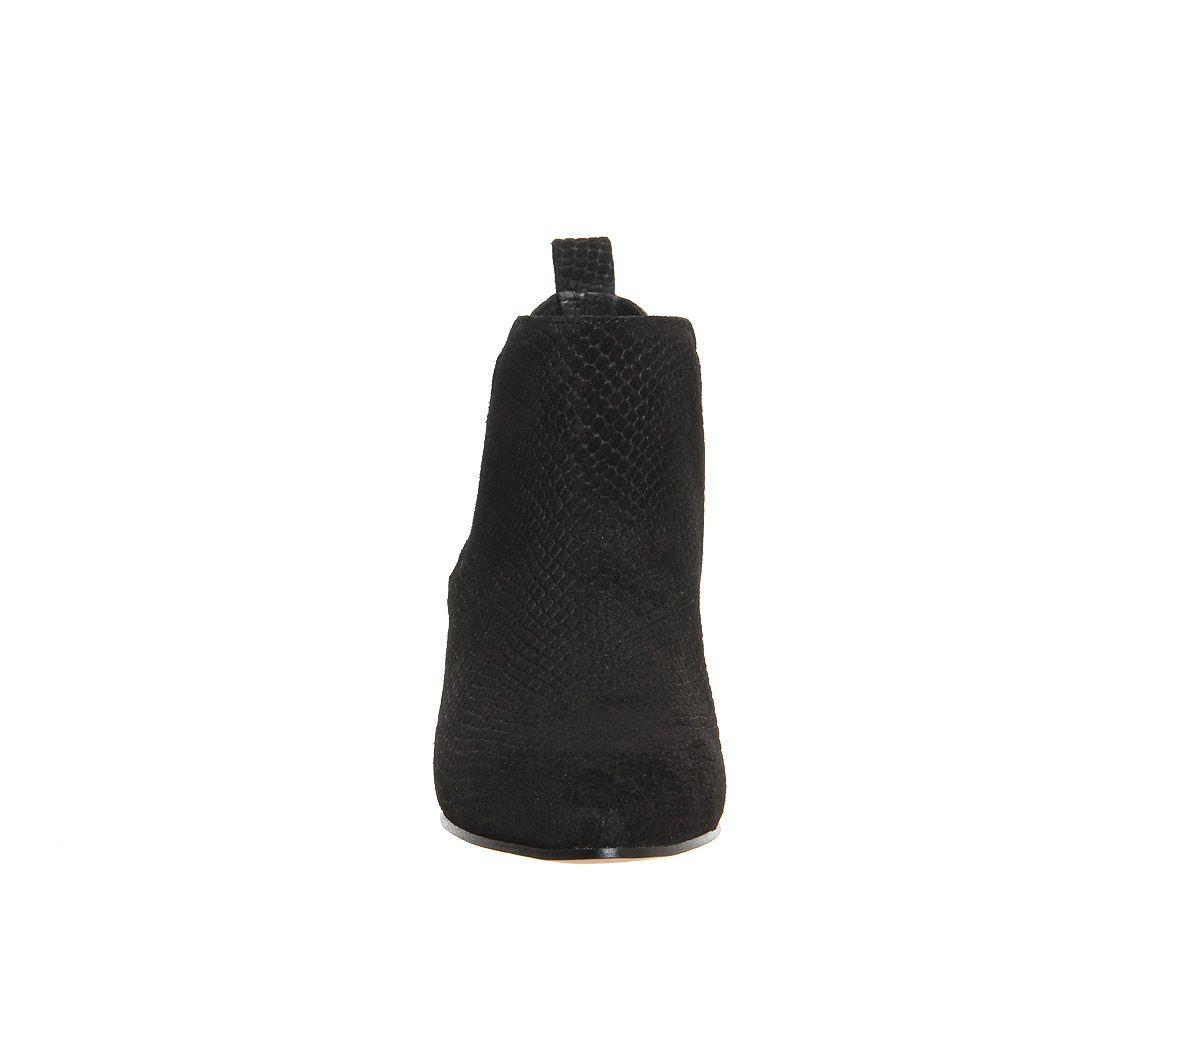 Office Coolcat Almond Toe Mod Chelsea Boots in Black Suede (Black)